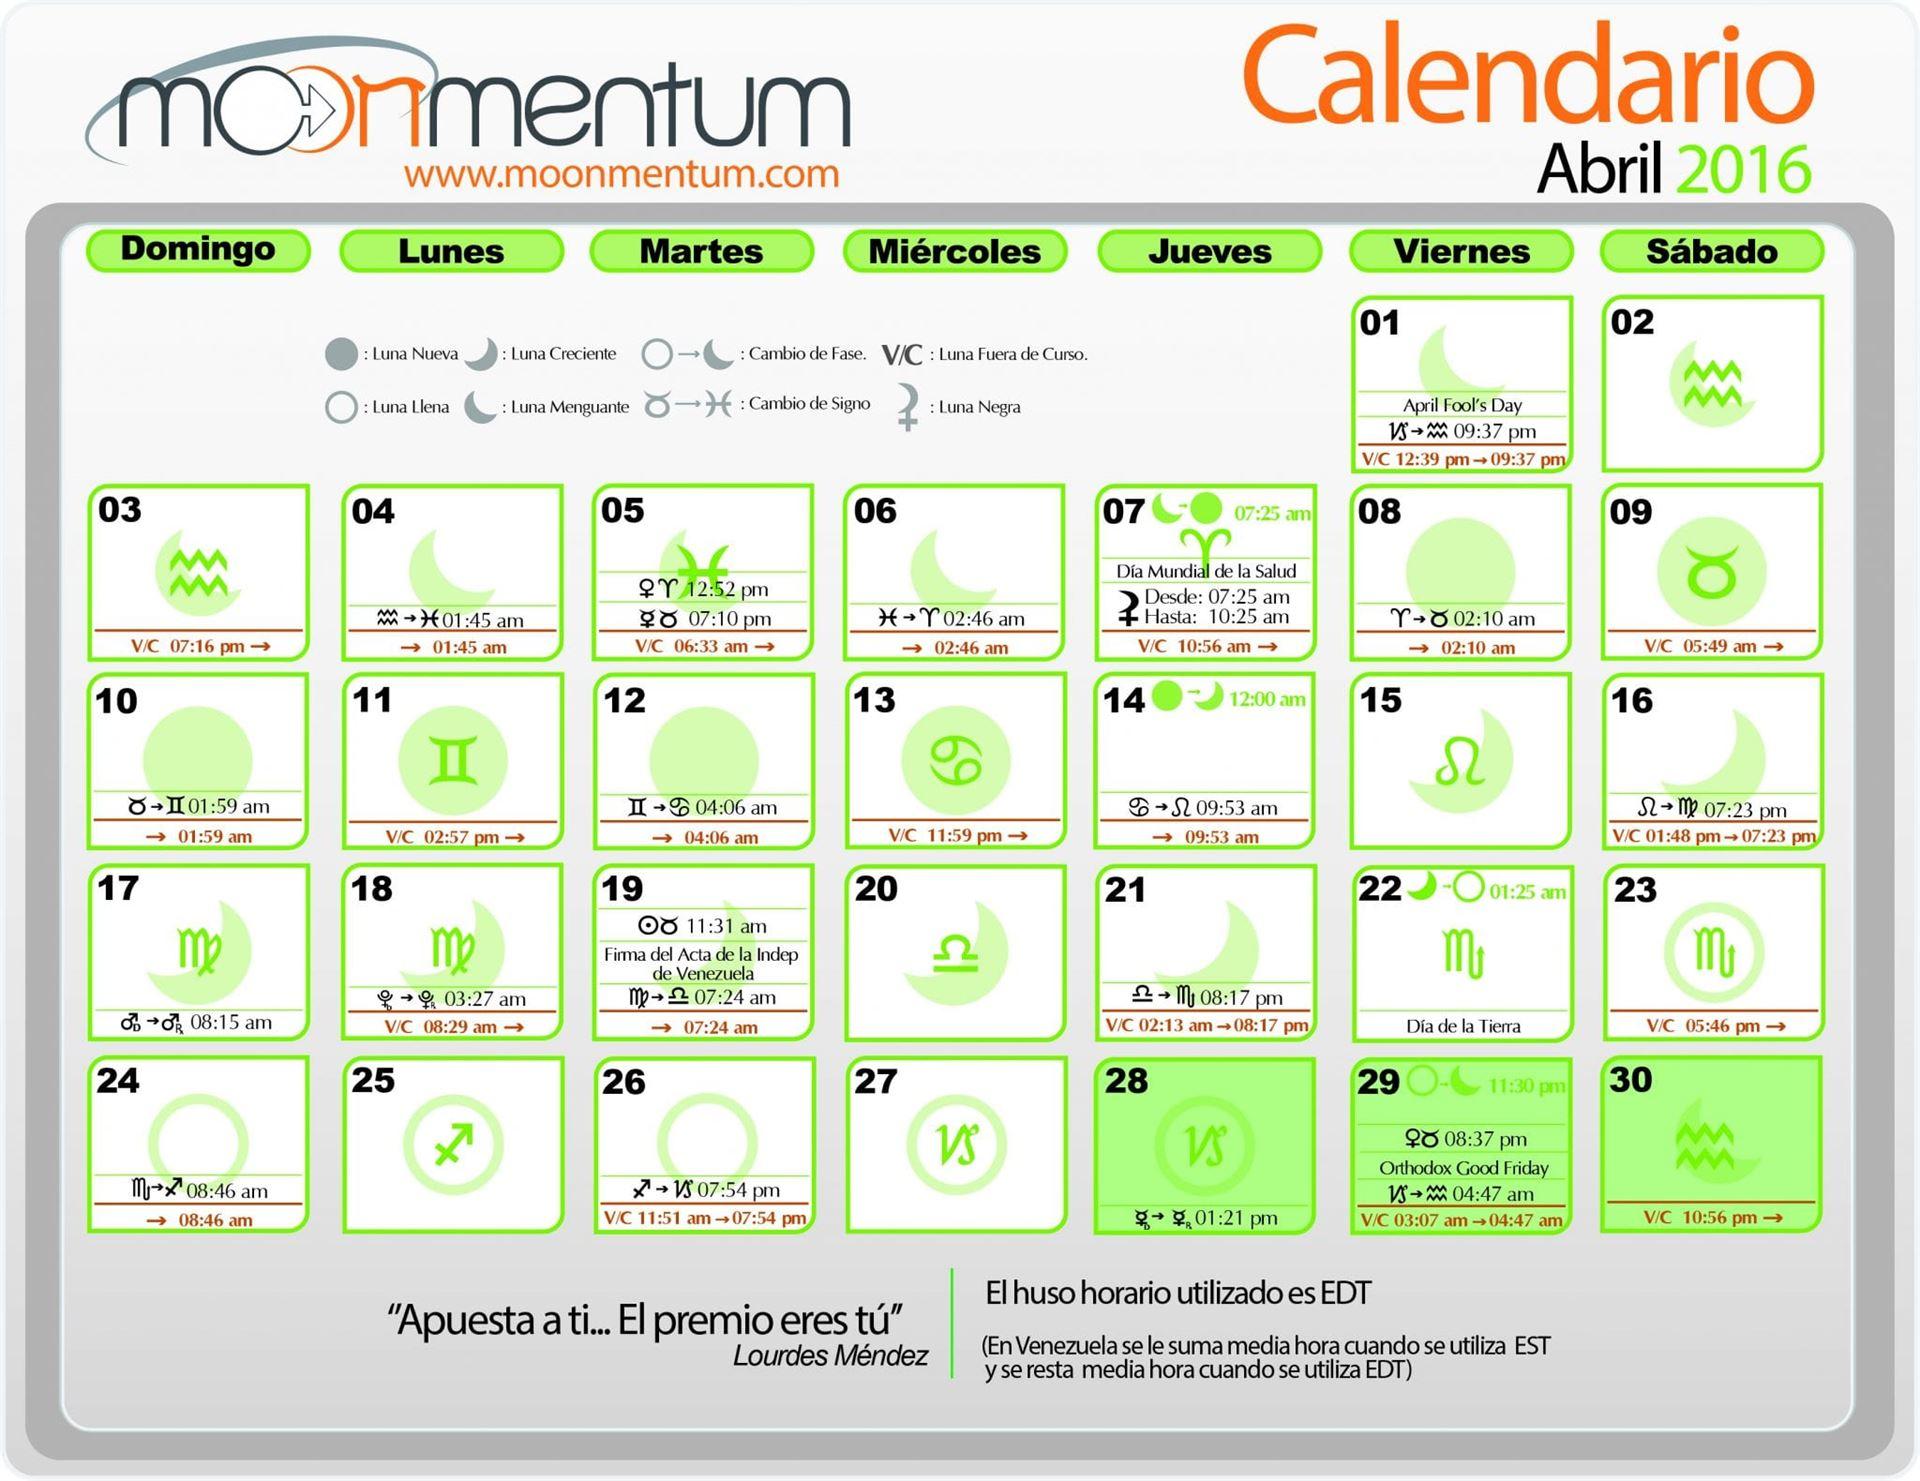 Calendario Abril 2016 Moonmentum